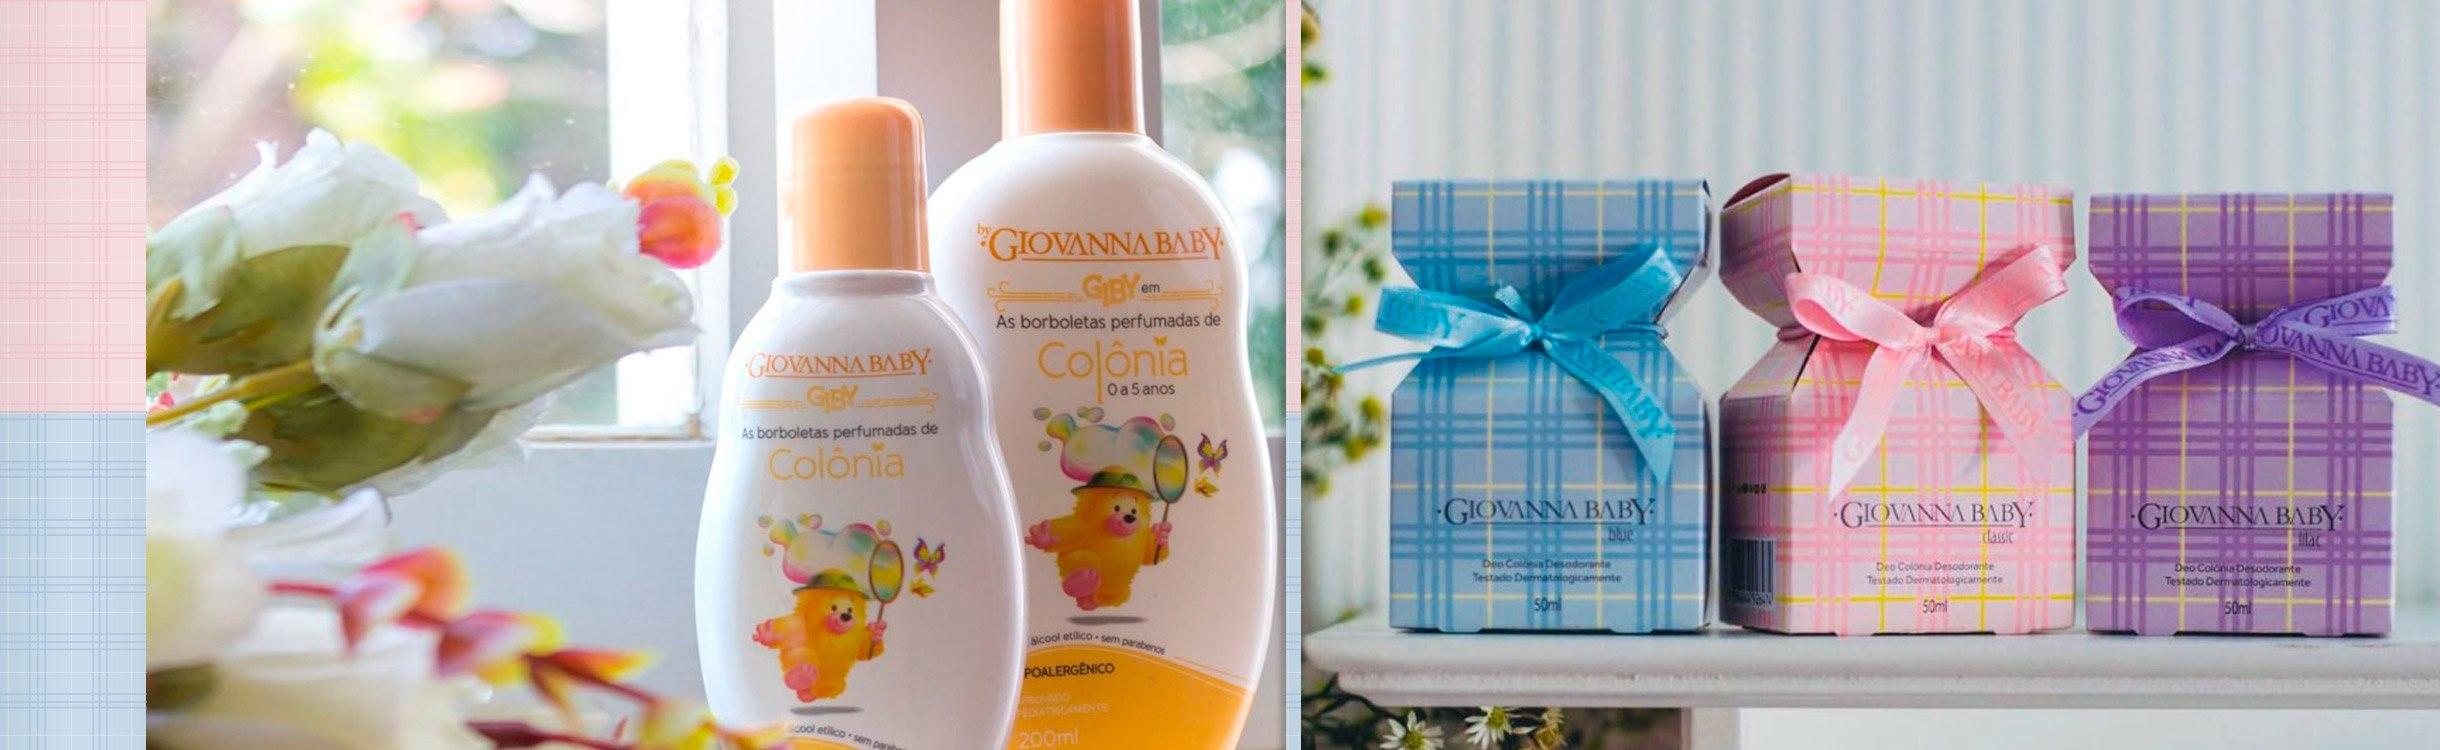 Perfumes e Perfumaria Giovanna Baby Infantil